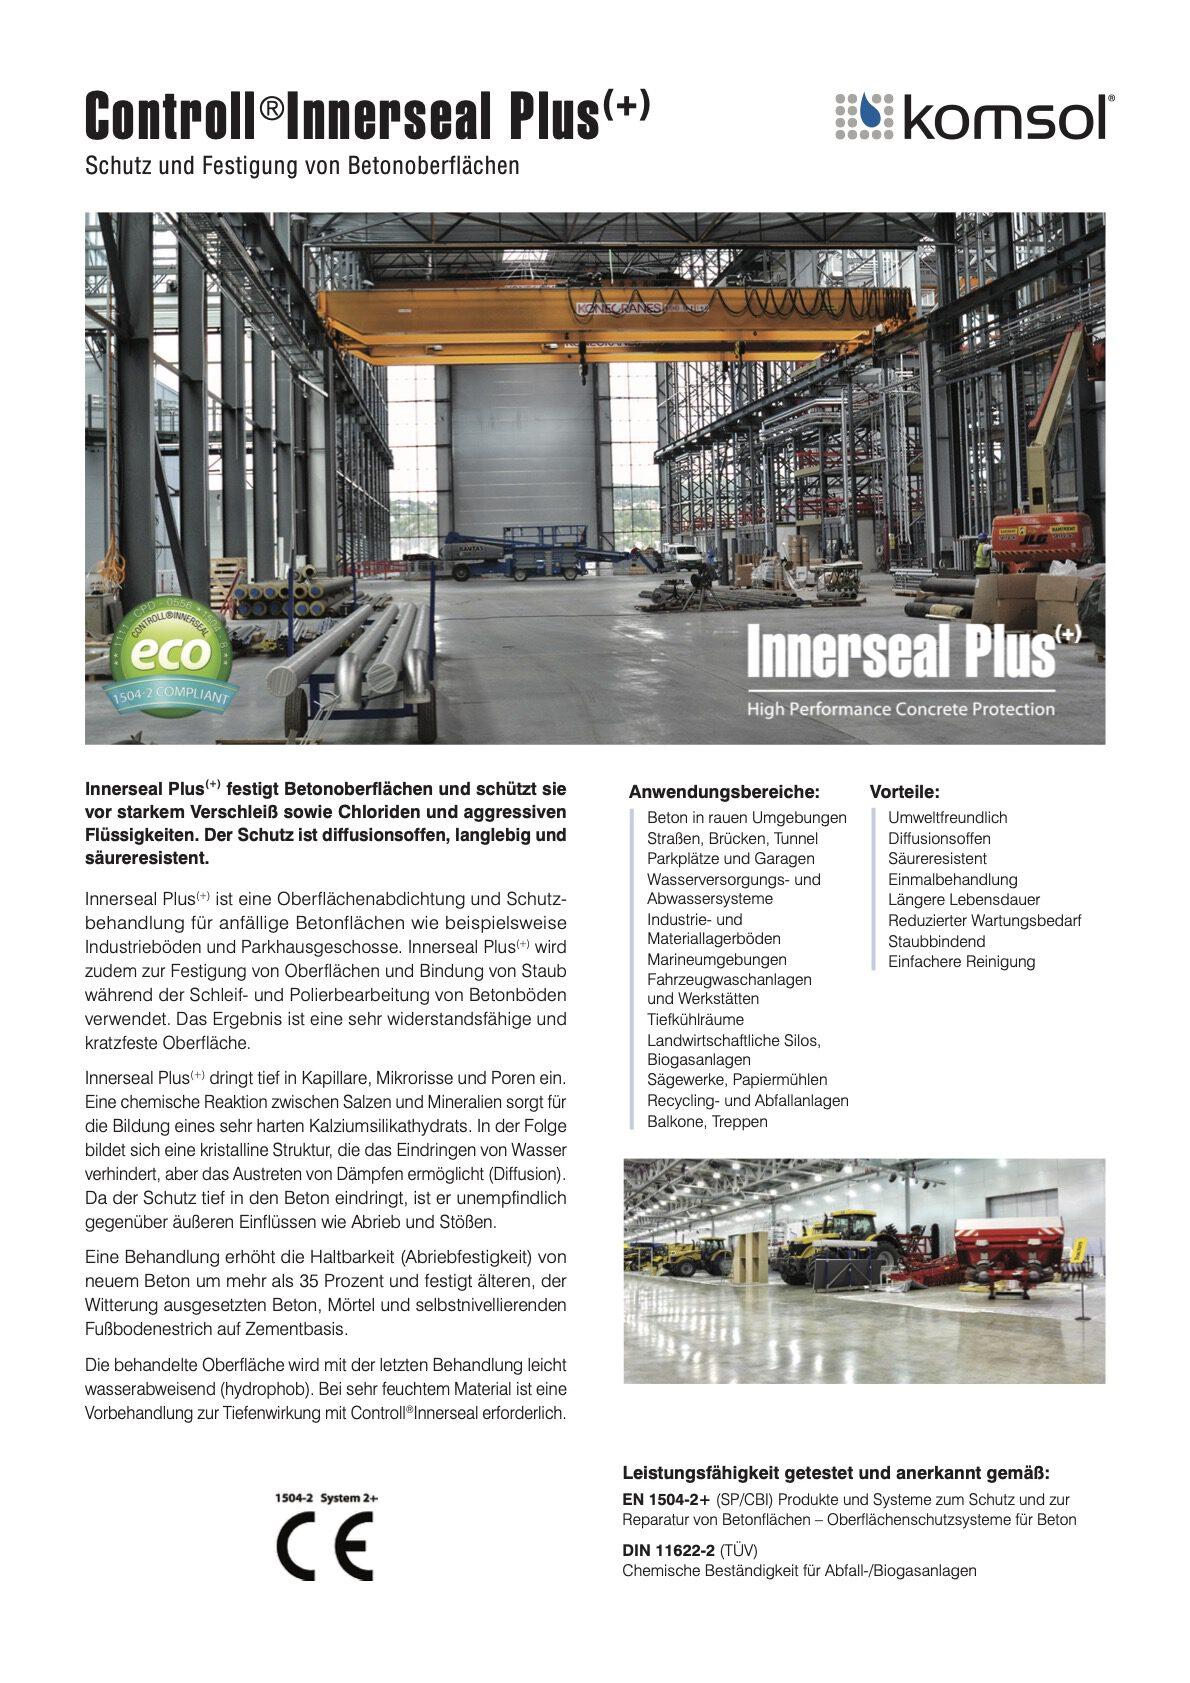 technisches datenblatt controll innerseal plus partner SALP Construction Deutschland